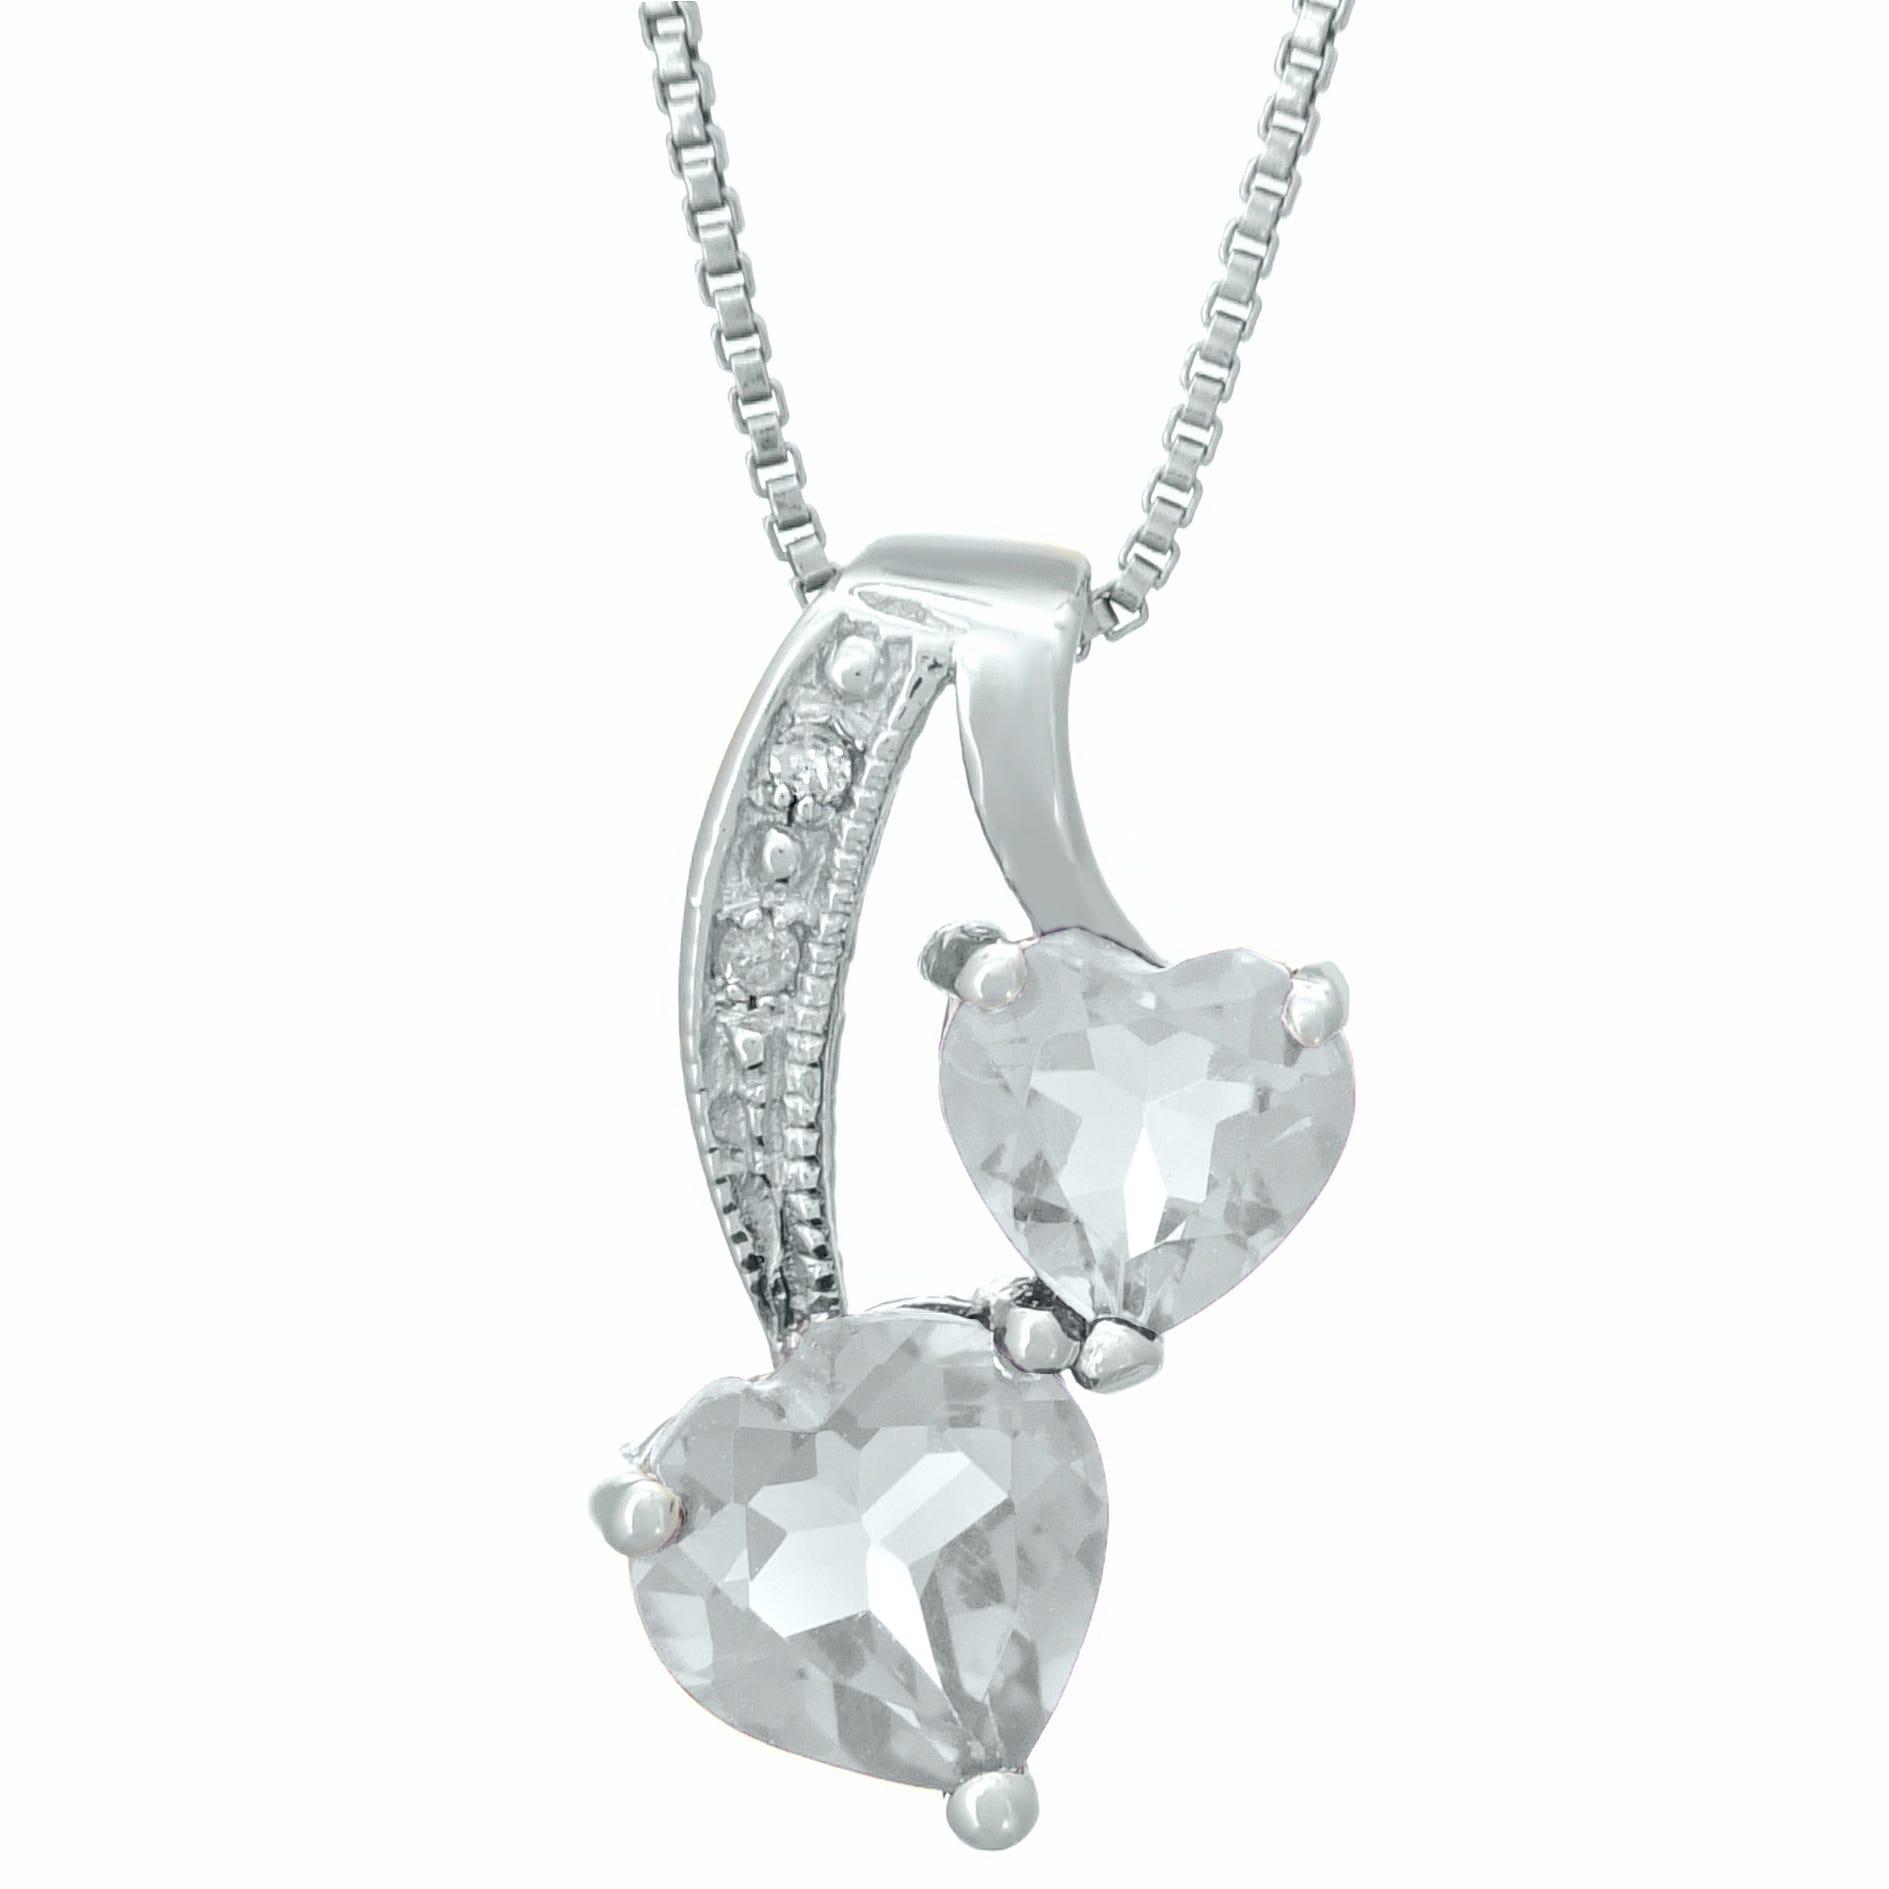 Heart Genuine White Topaz Diamond Sterling Silver Pendant 18